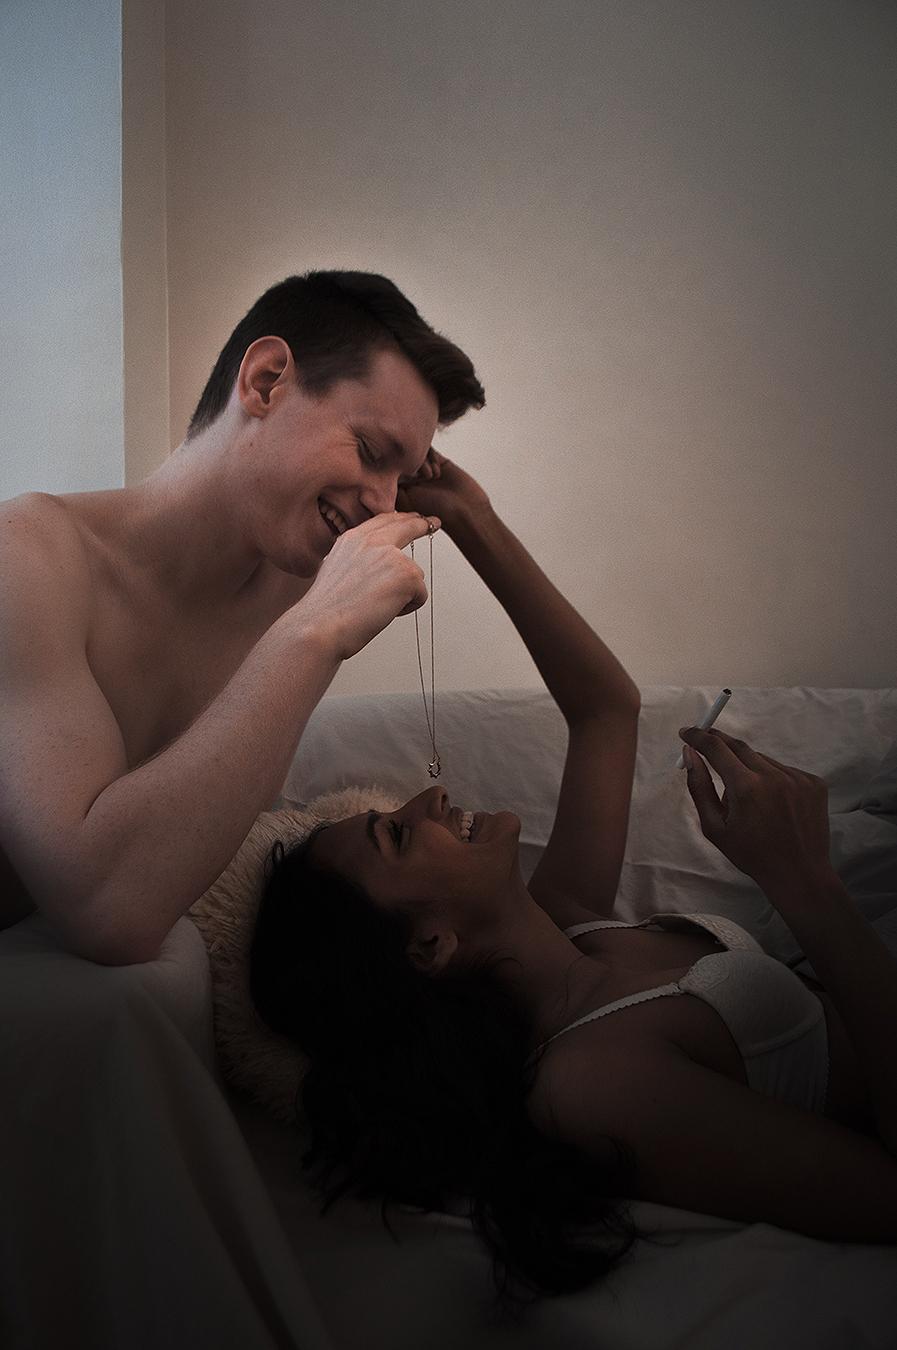 Noel_Zheng_photography_student_upenn_university_of_pennsylvania_Tony_Ward_Studio_Isuru_Amarasekera_Thomas_Calder_war_emotion_happiness_love_lingerie_necklace_cigarette_smoking_sofa_couch